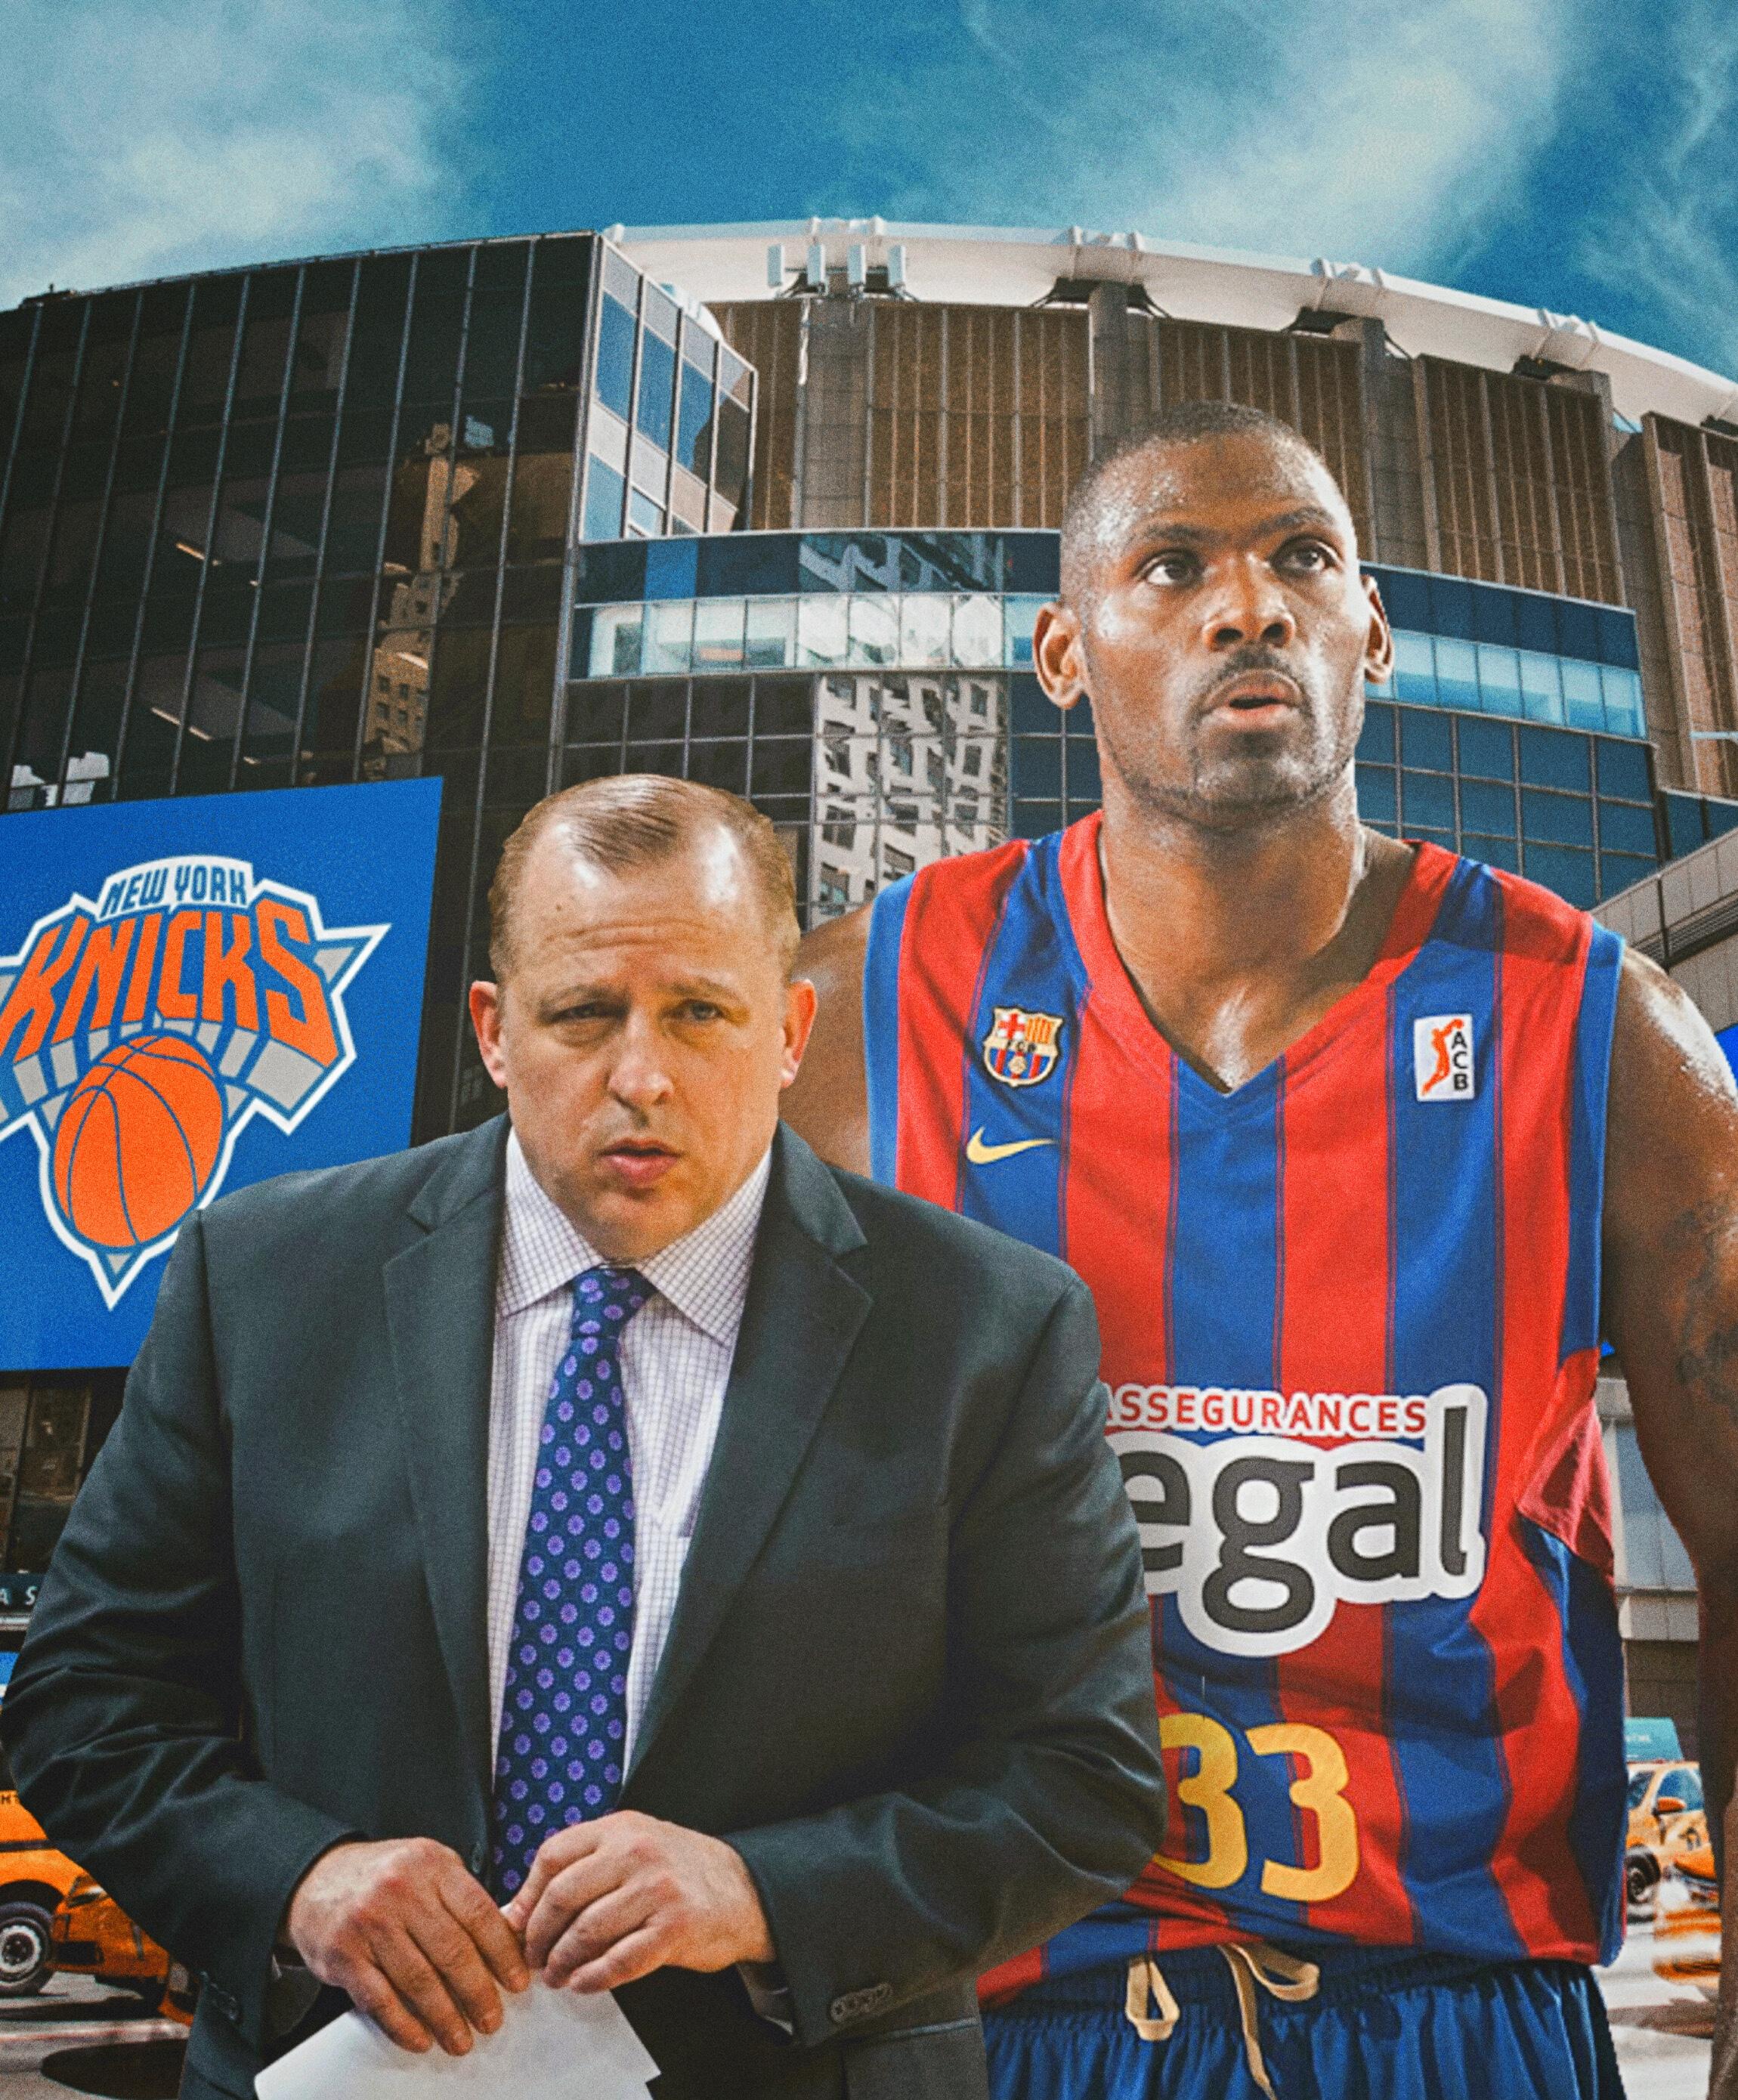 Knicks, rom thibodeau, Pete mickeal